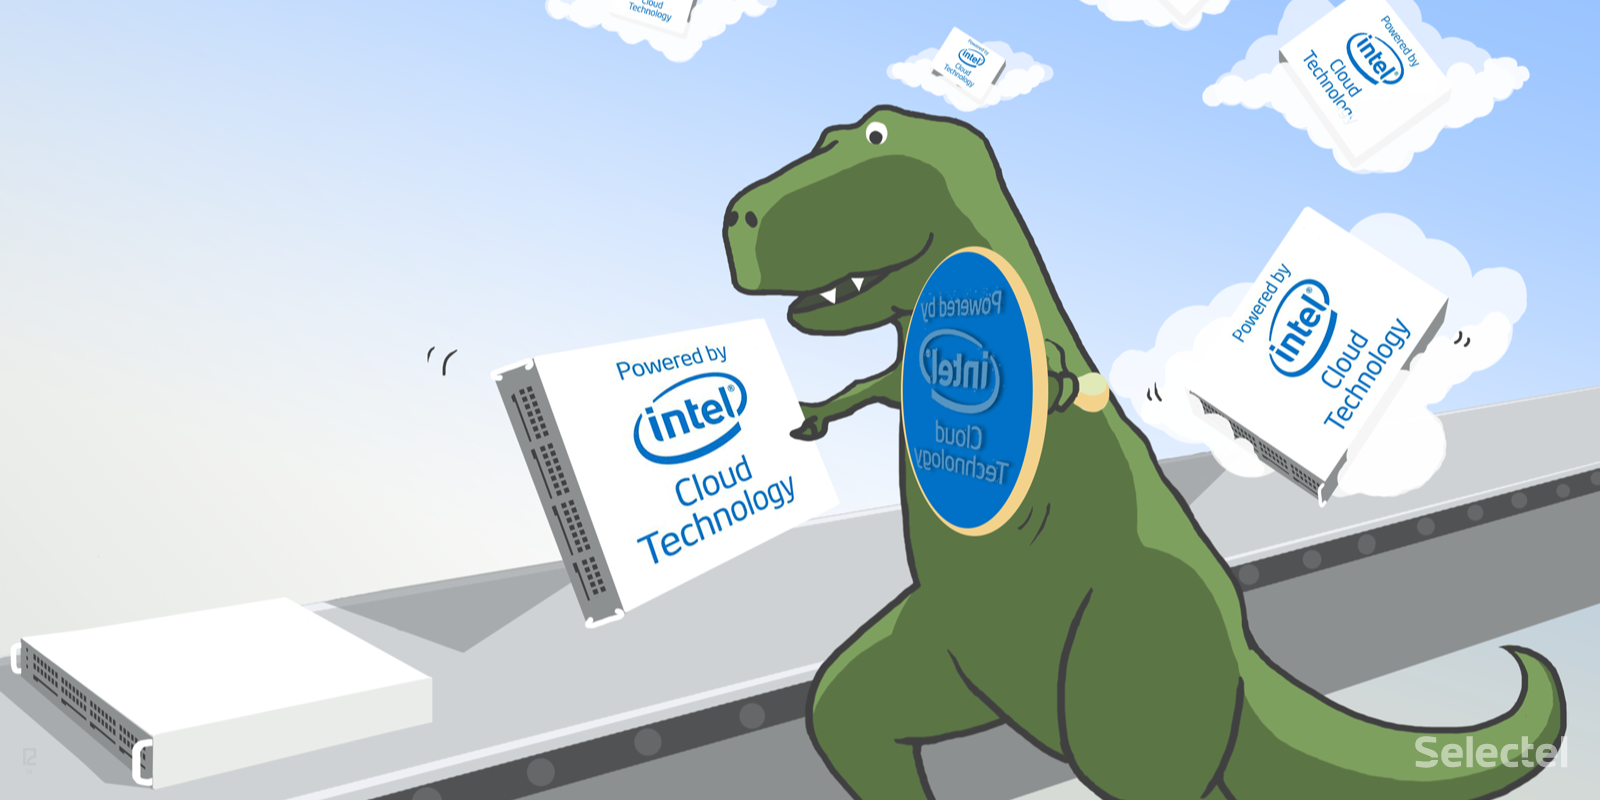 Селектел — участник программы «Intel Cloud Technology»